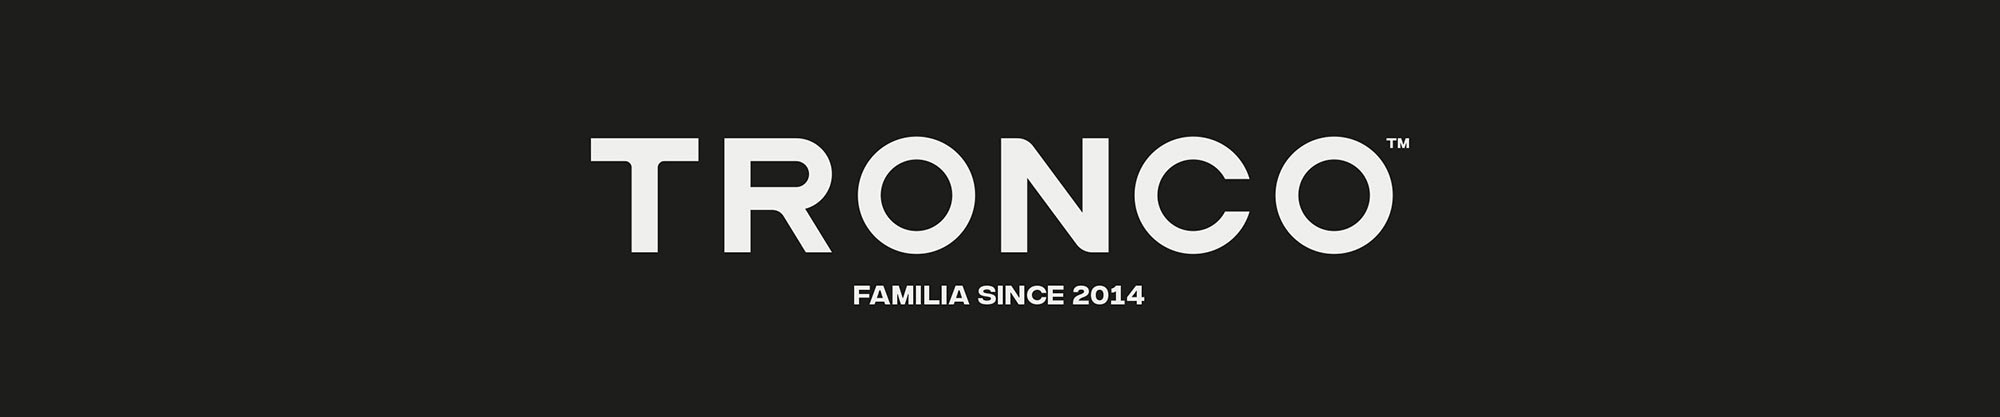 TRONCO_04